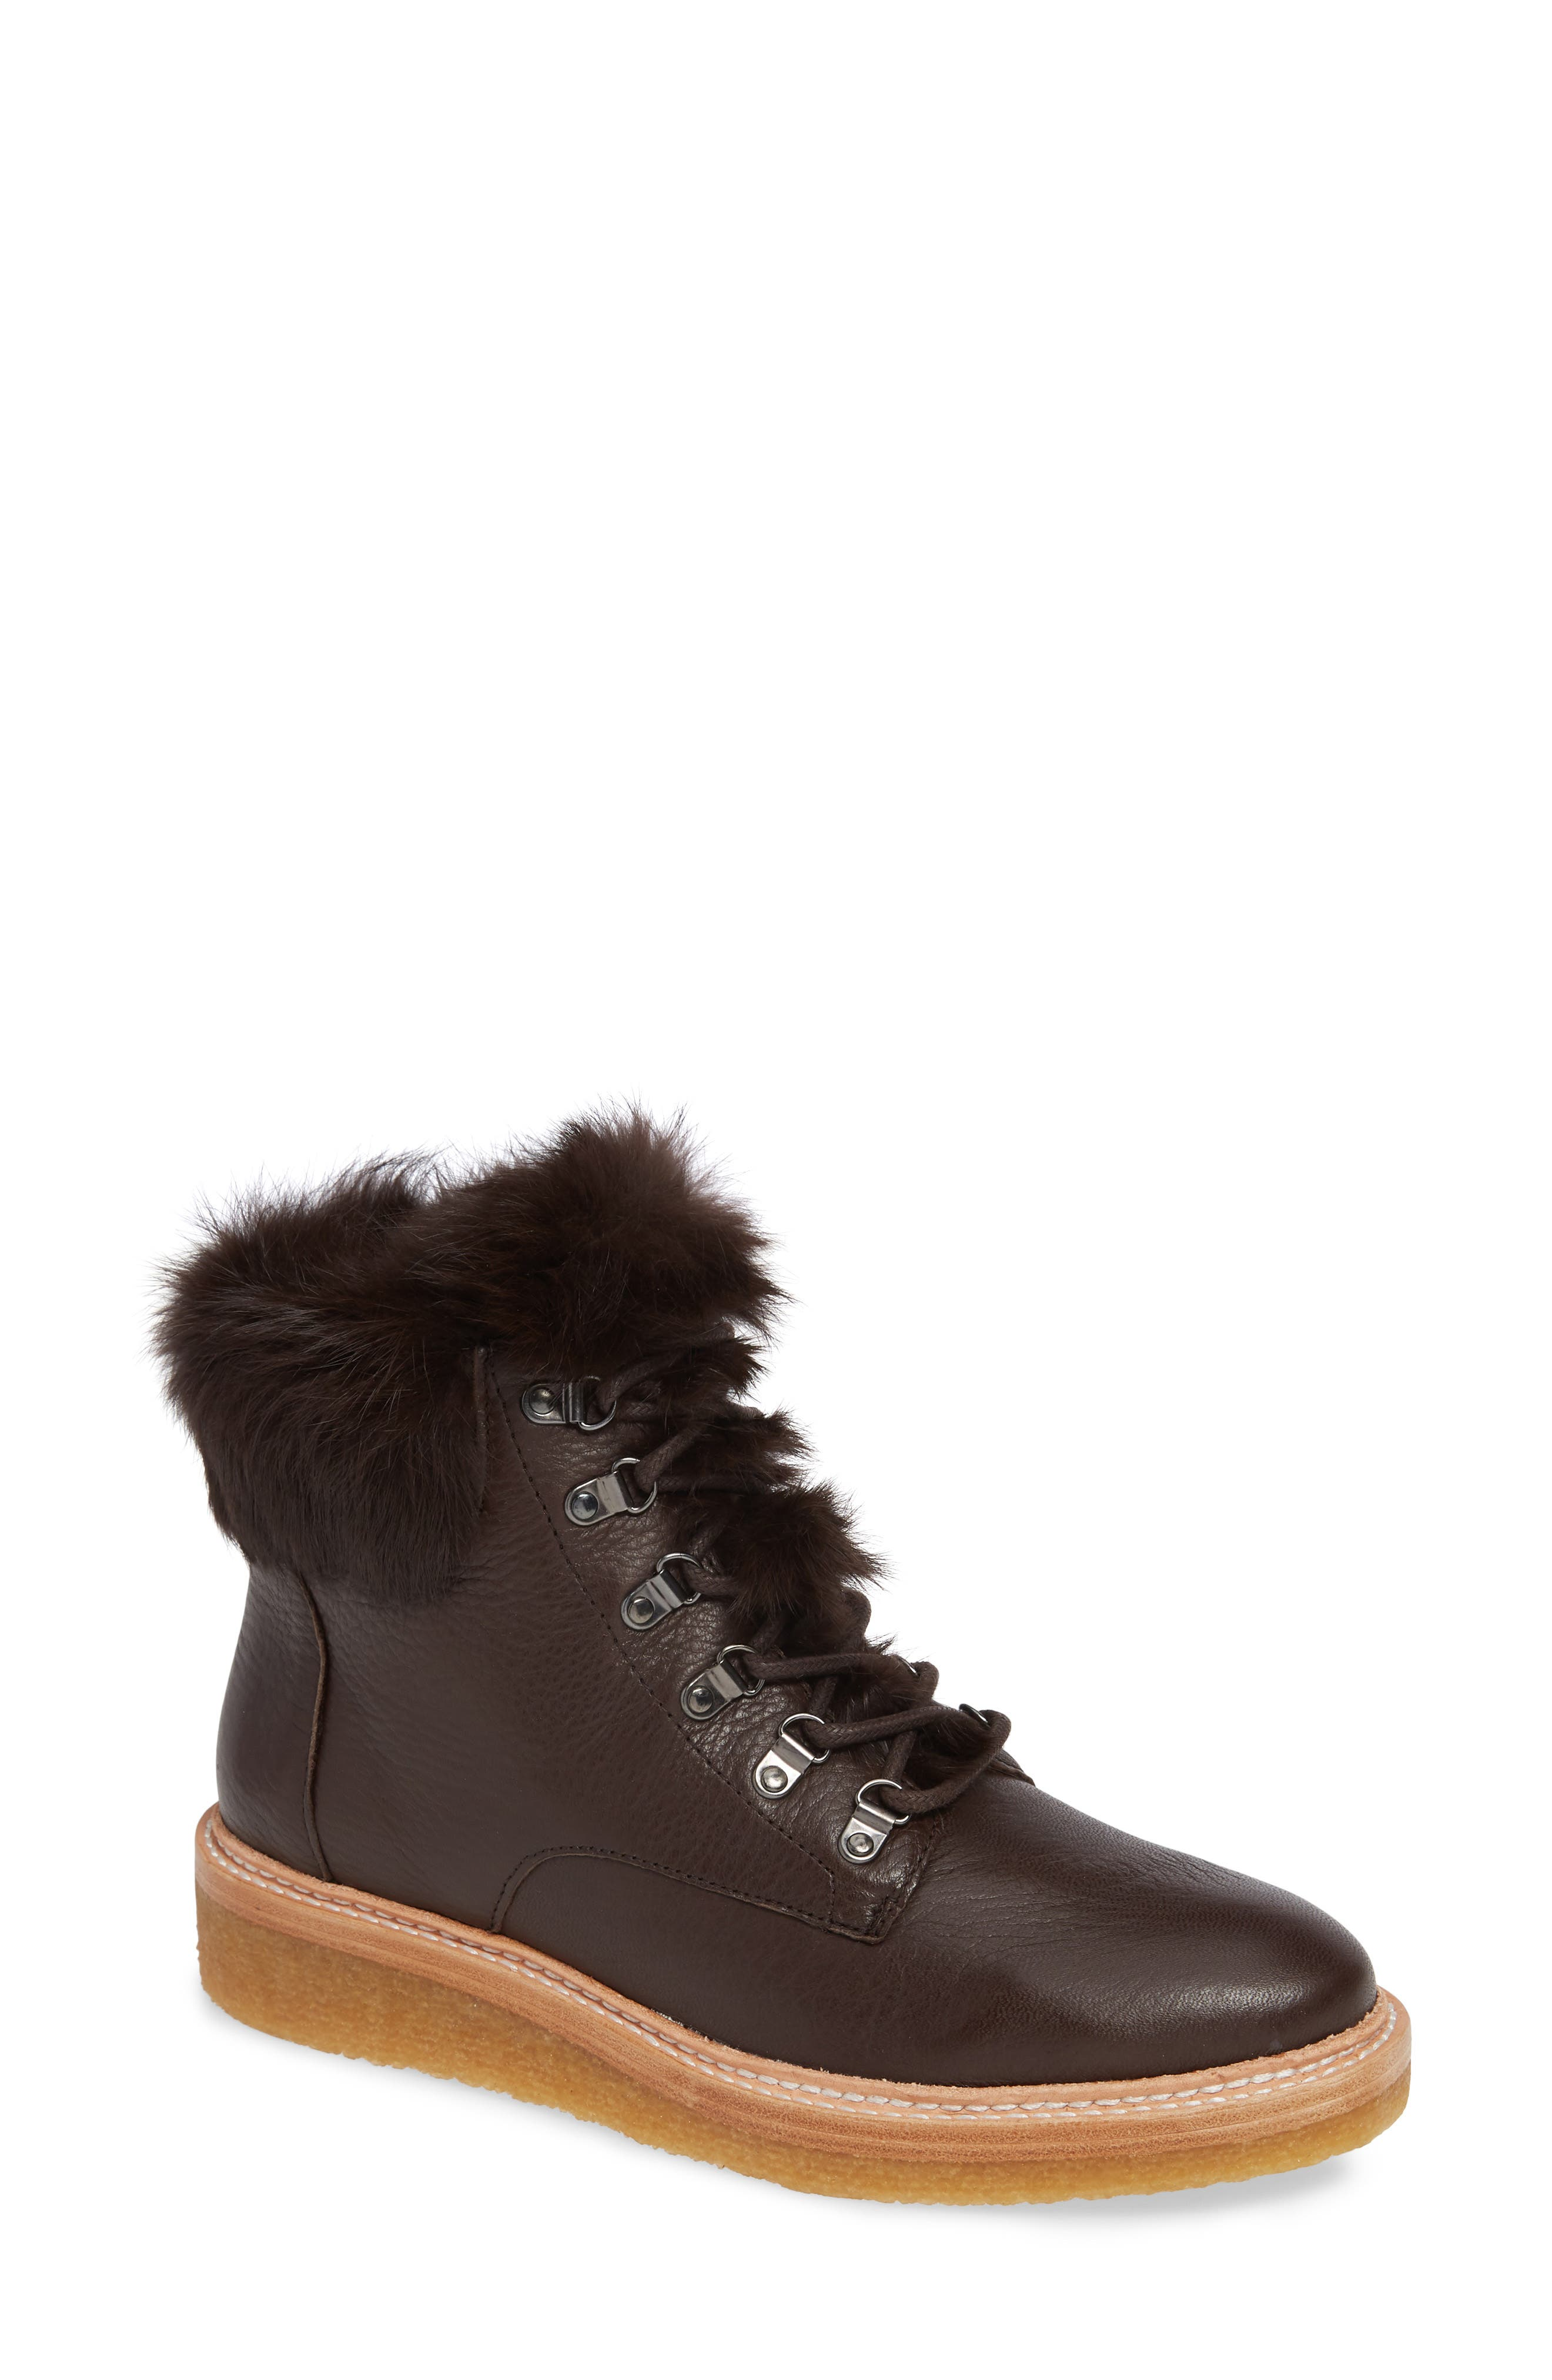 Winter Genuine Rabbit Fur Trim Boot,                         Main,                         color, MOCHA LEATHER